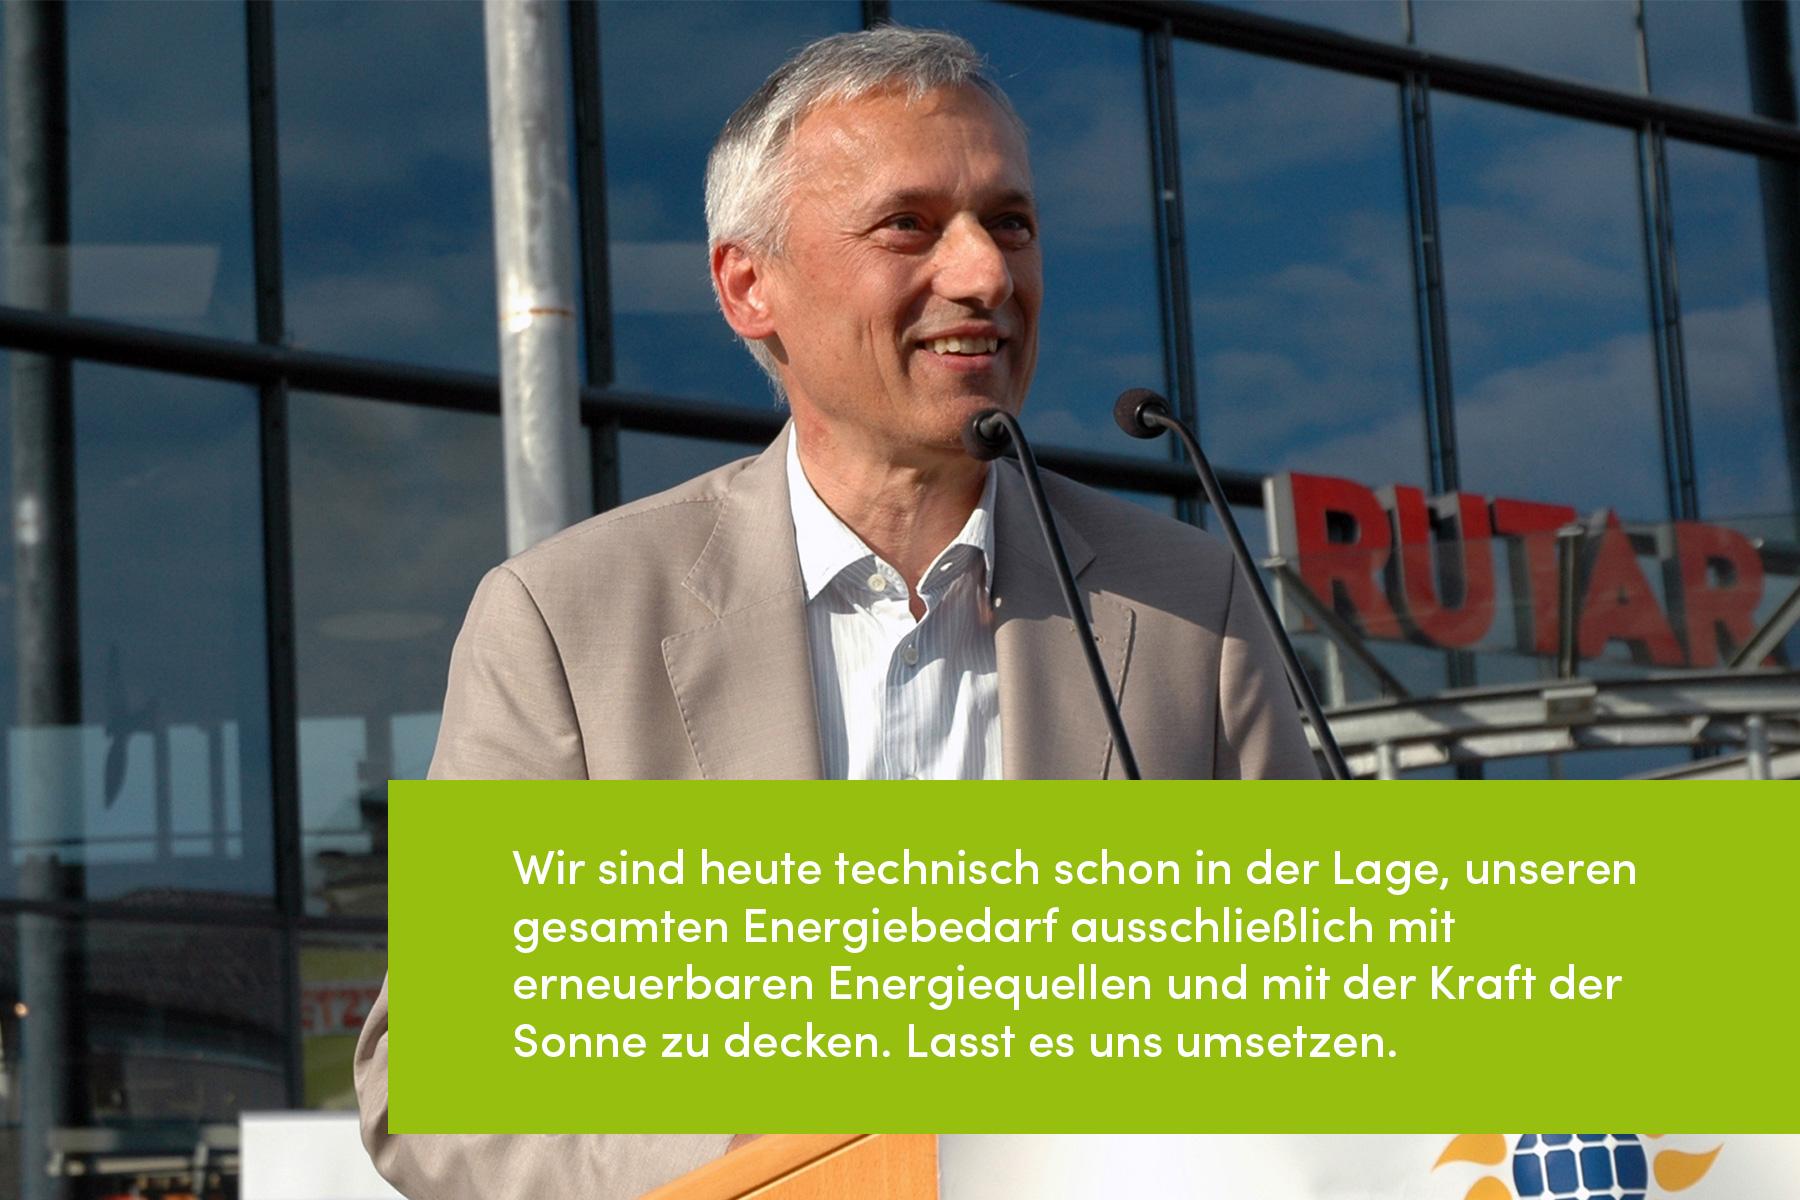 guenter_grabner2_de